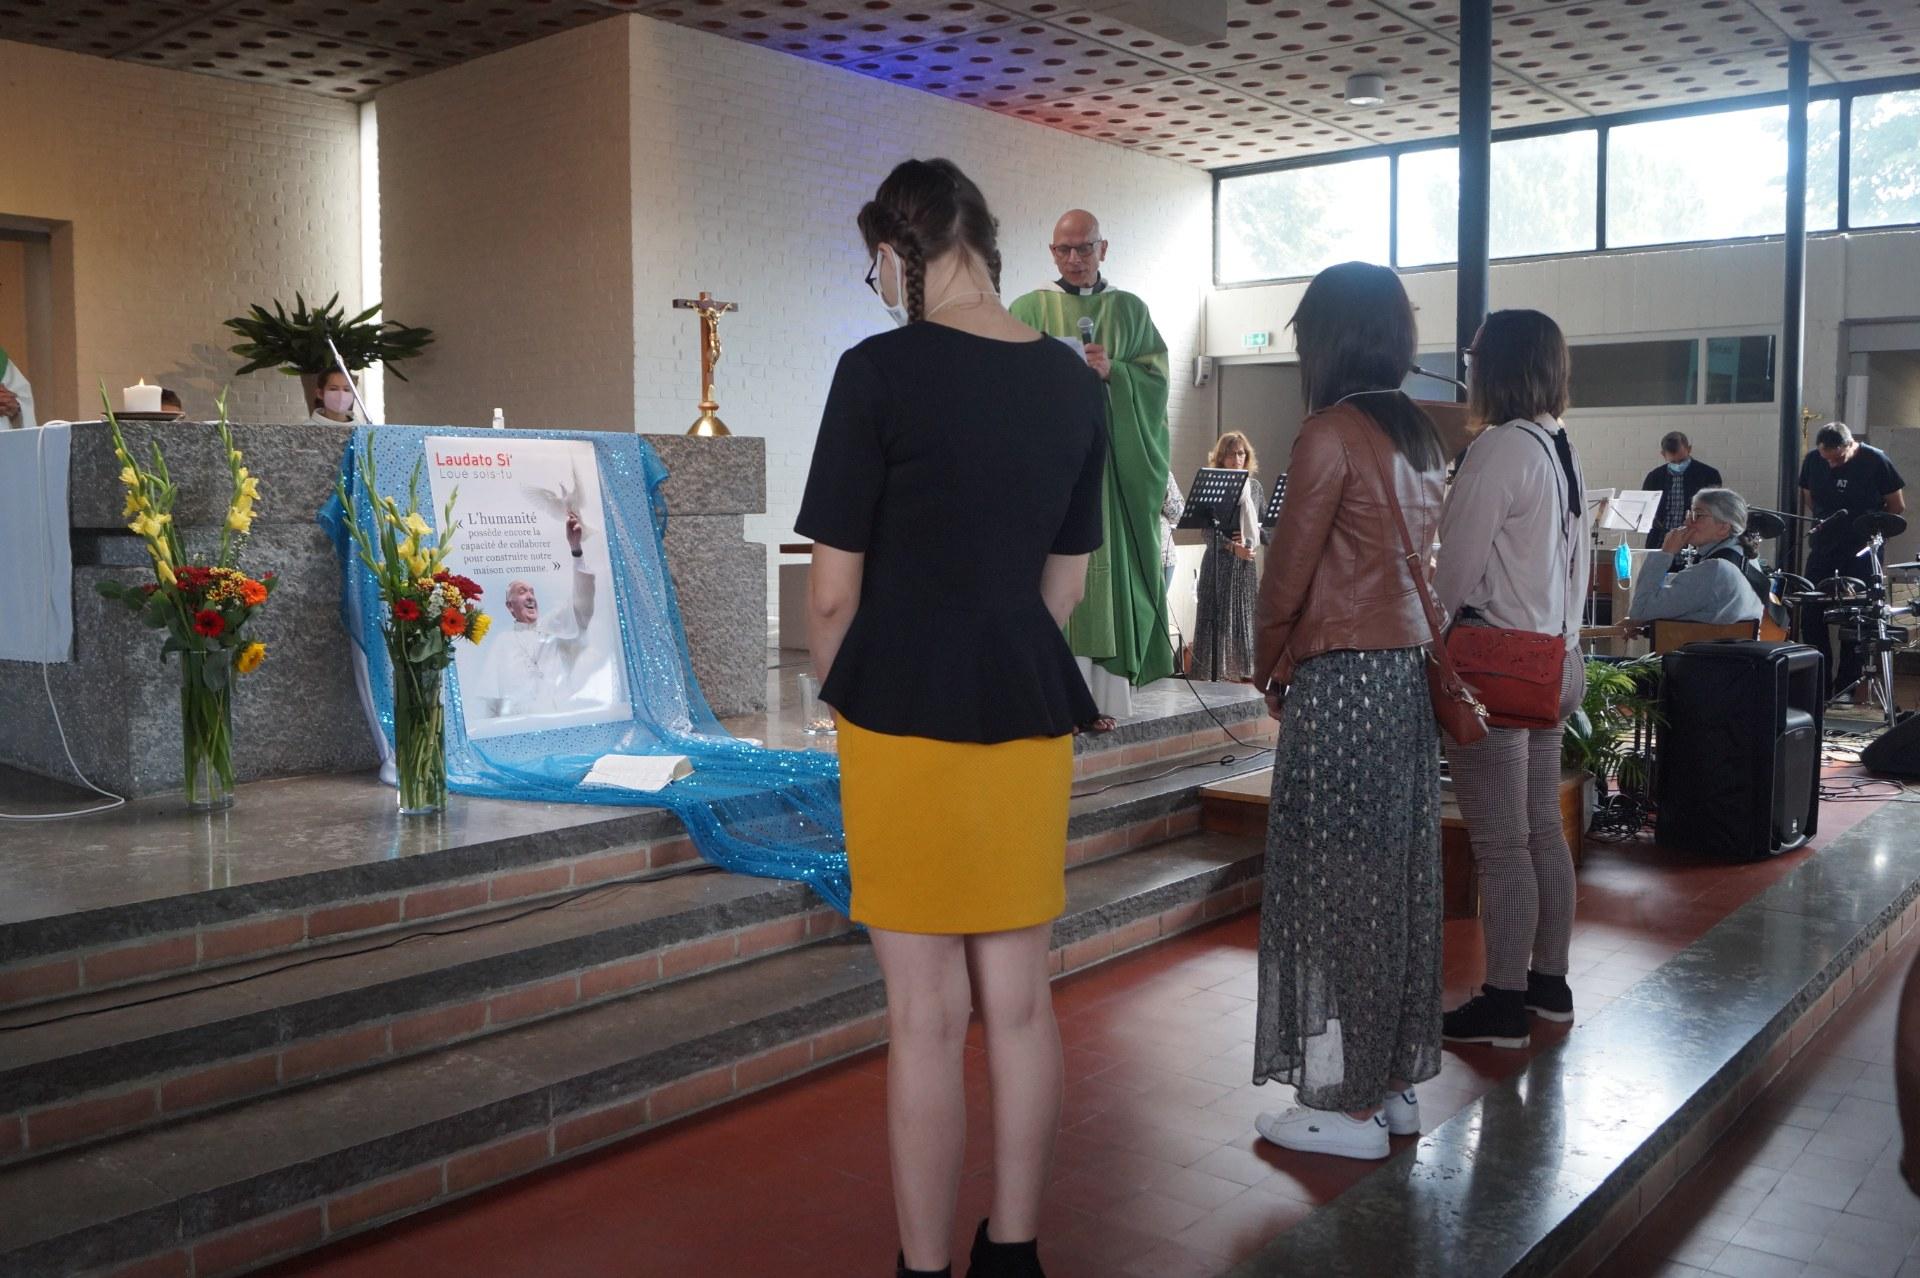 entree en catechumenat 6 sept 2020 (34)